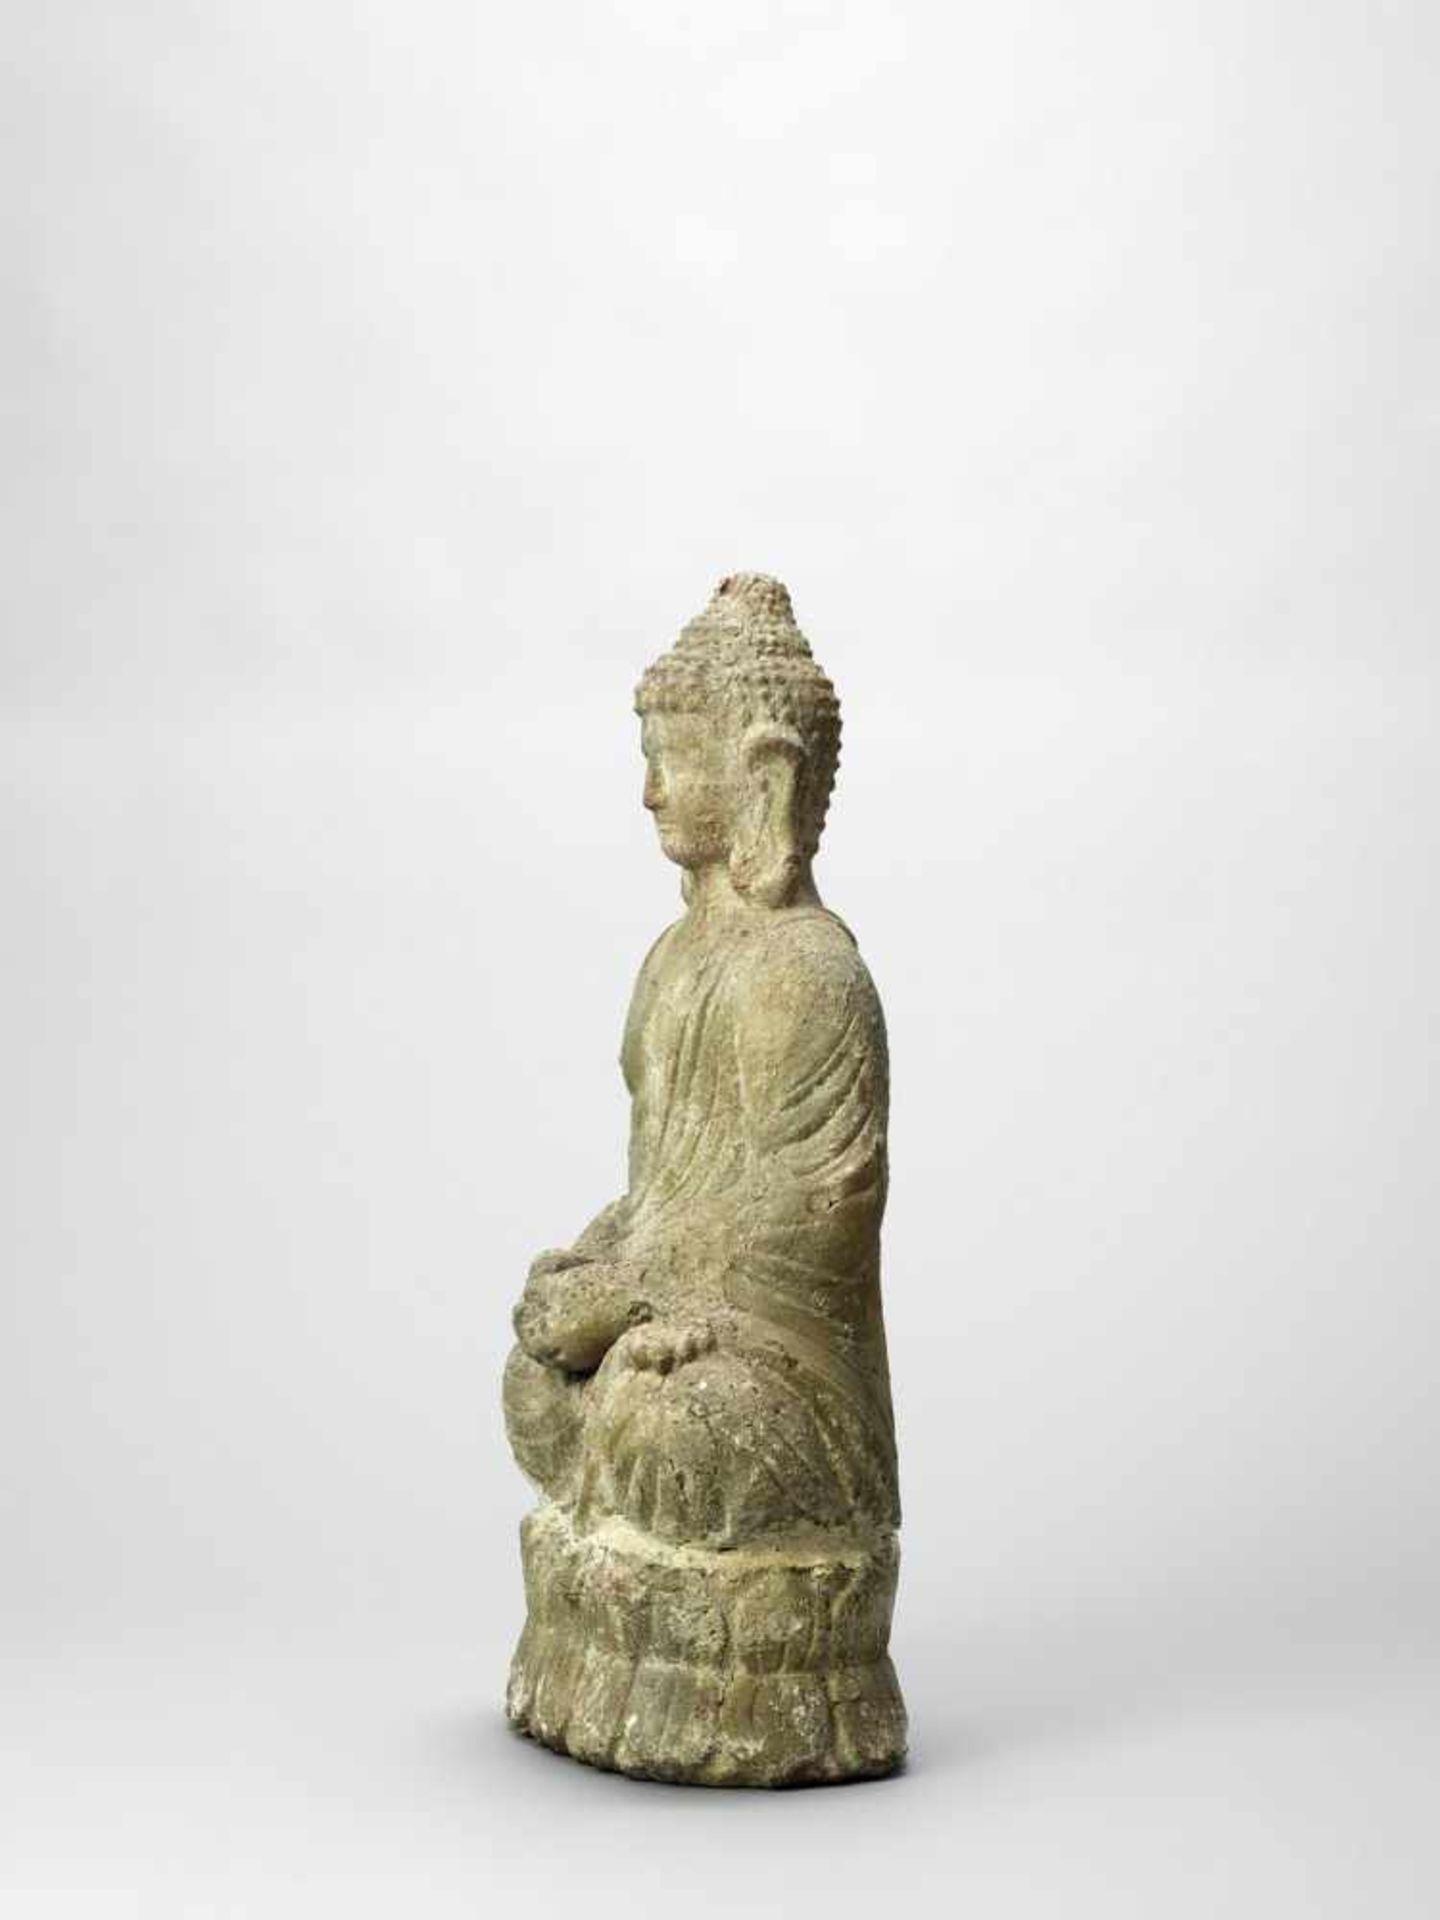 Los 394 - A TERRACOTTA FIGURE OF BUDDHA, 19TH CENTURY